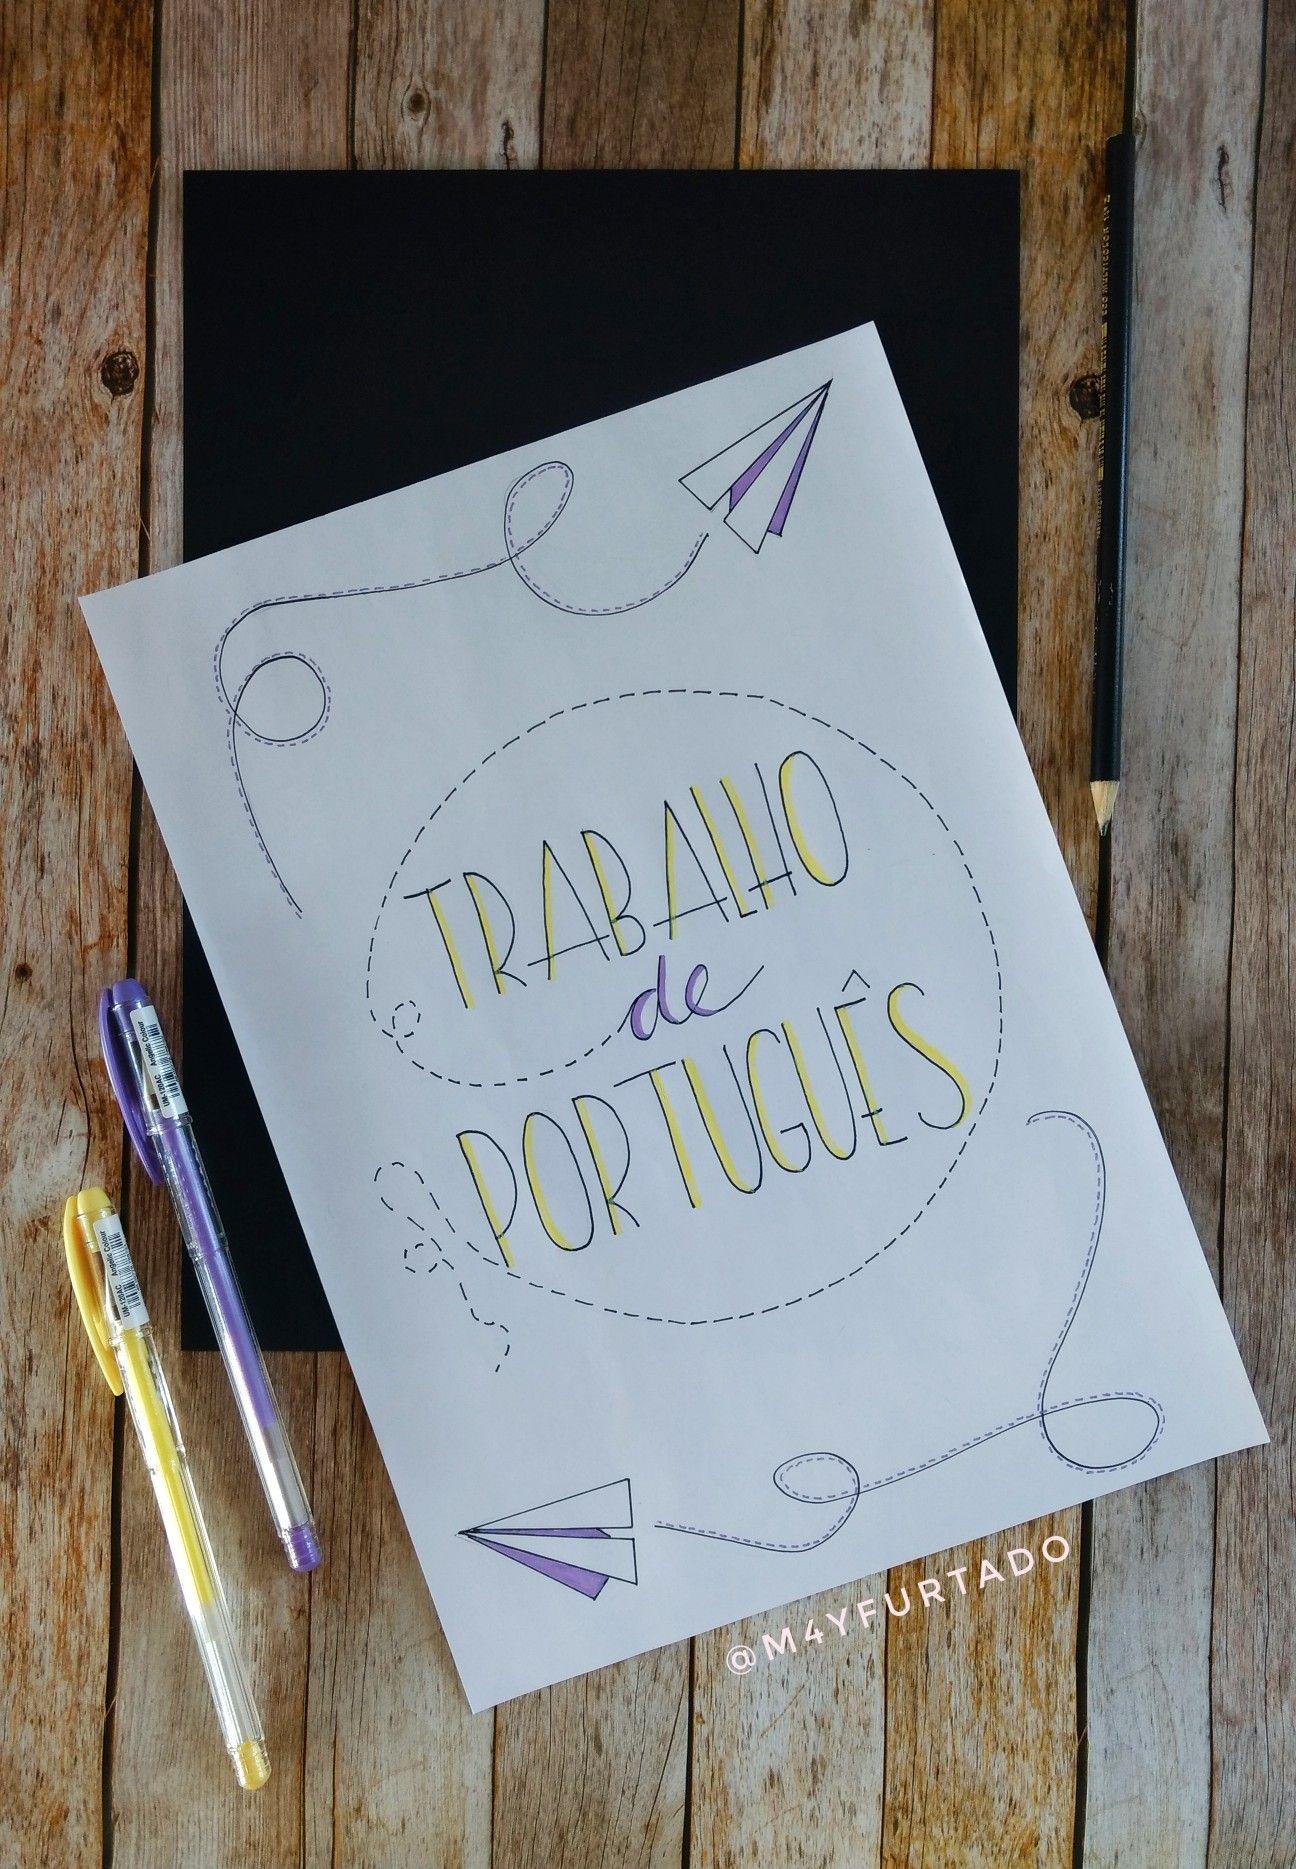 Capas para trabalhos escolares | Estudos | Pinterest | Schriftarten